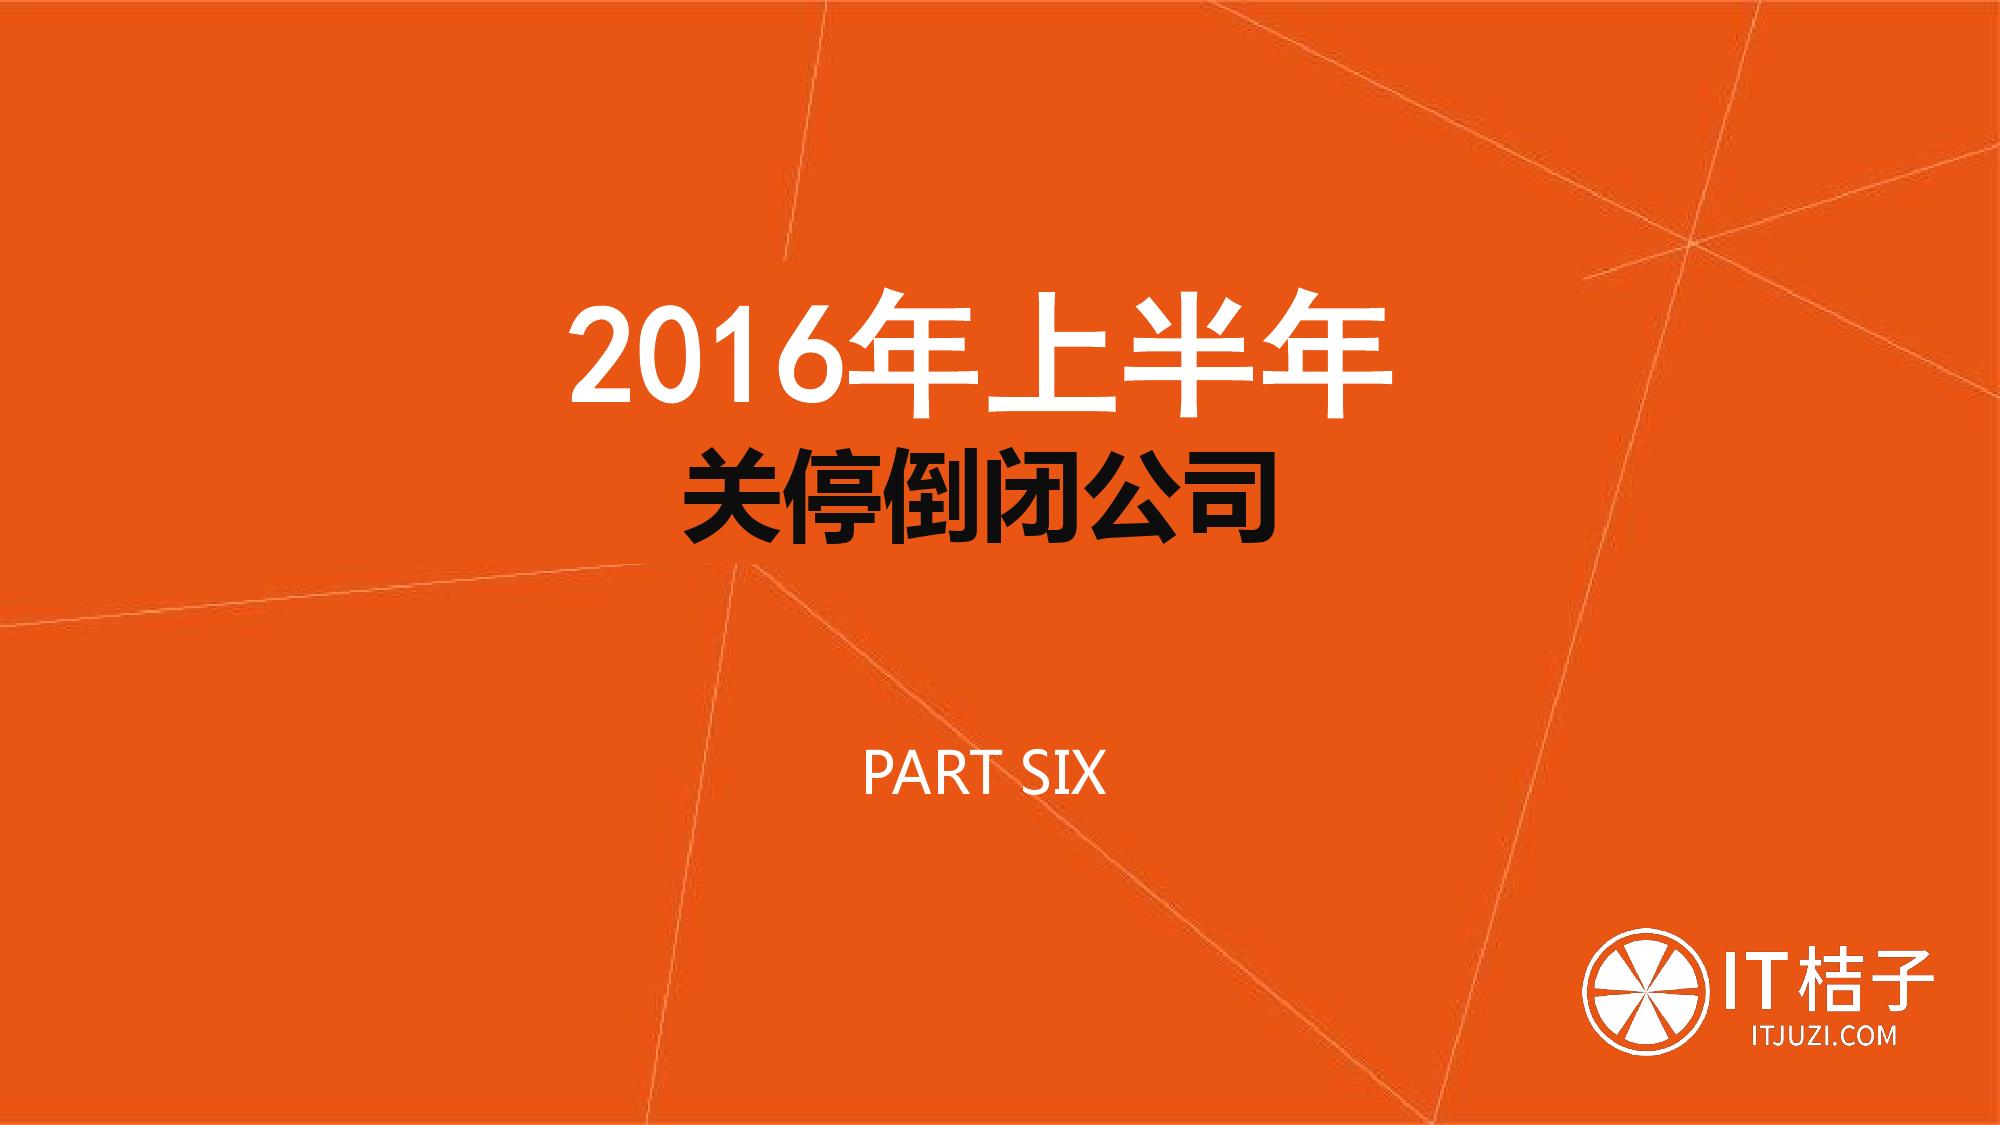 【IT桔子】2016年Q2中国互联网创业投资分析报告_000056